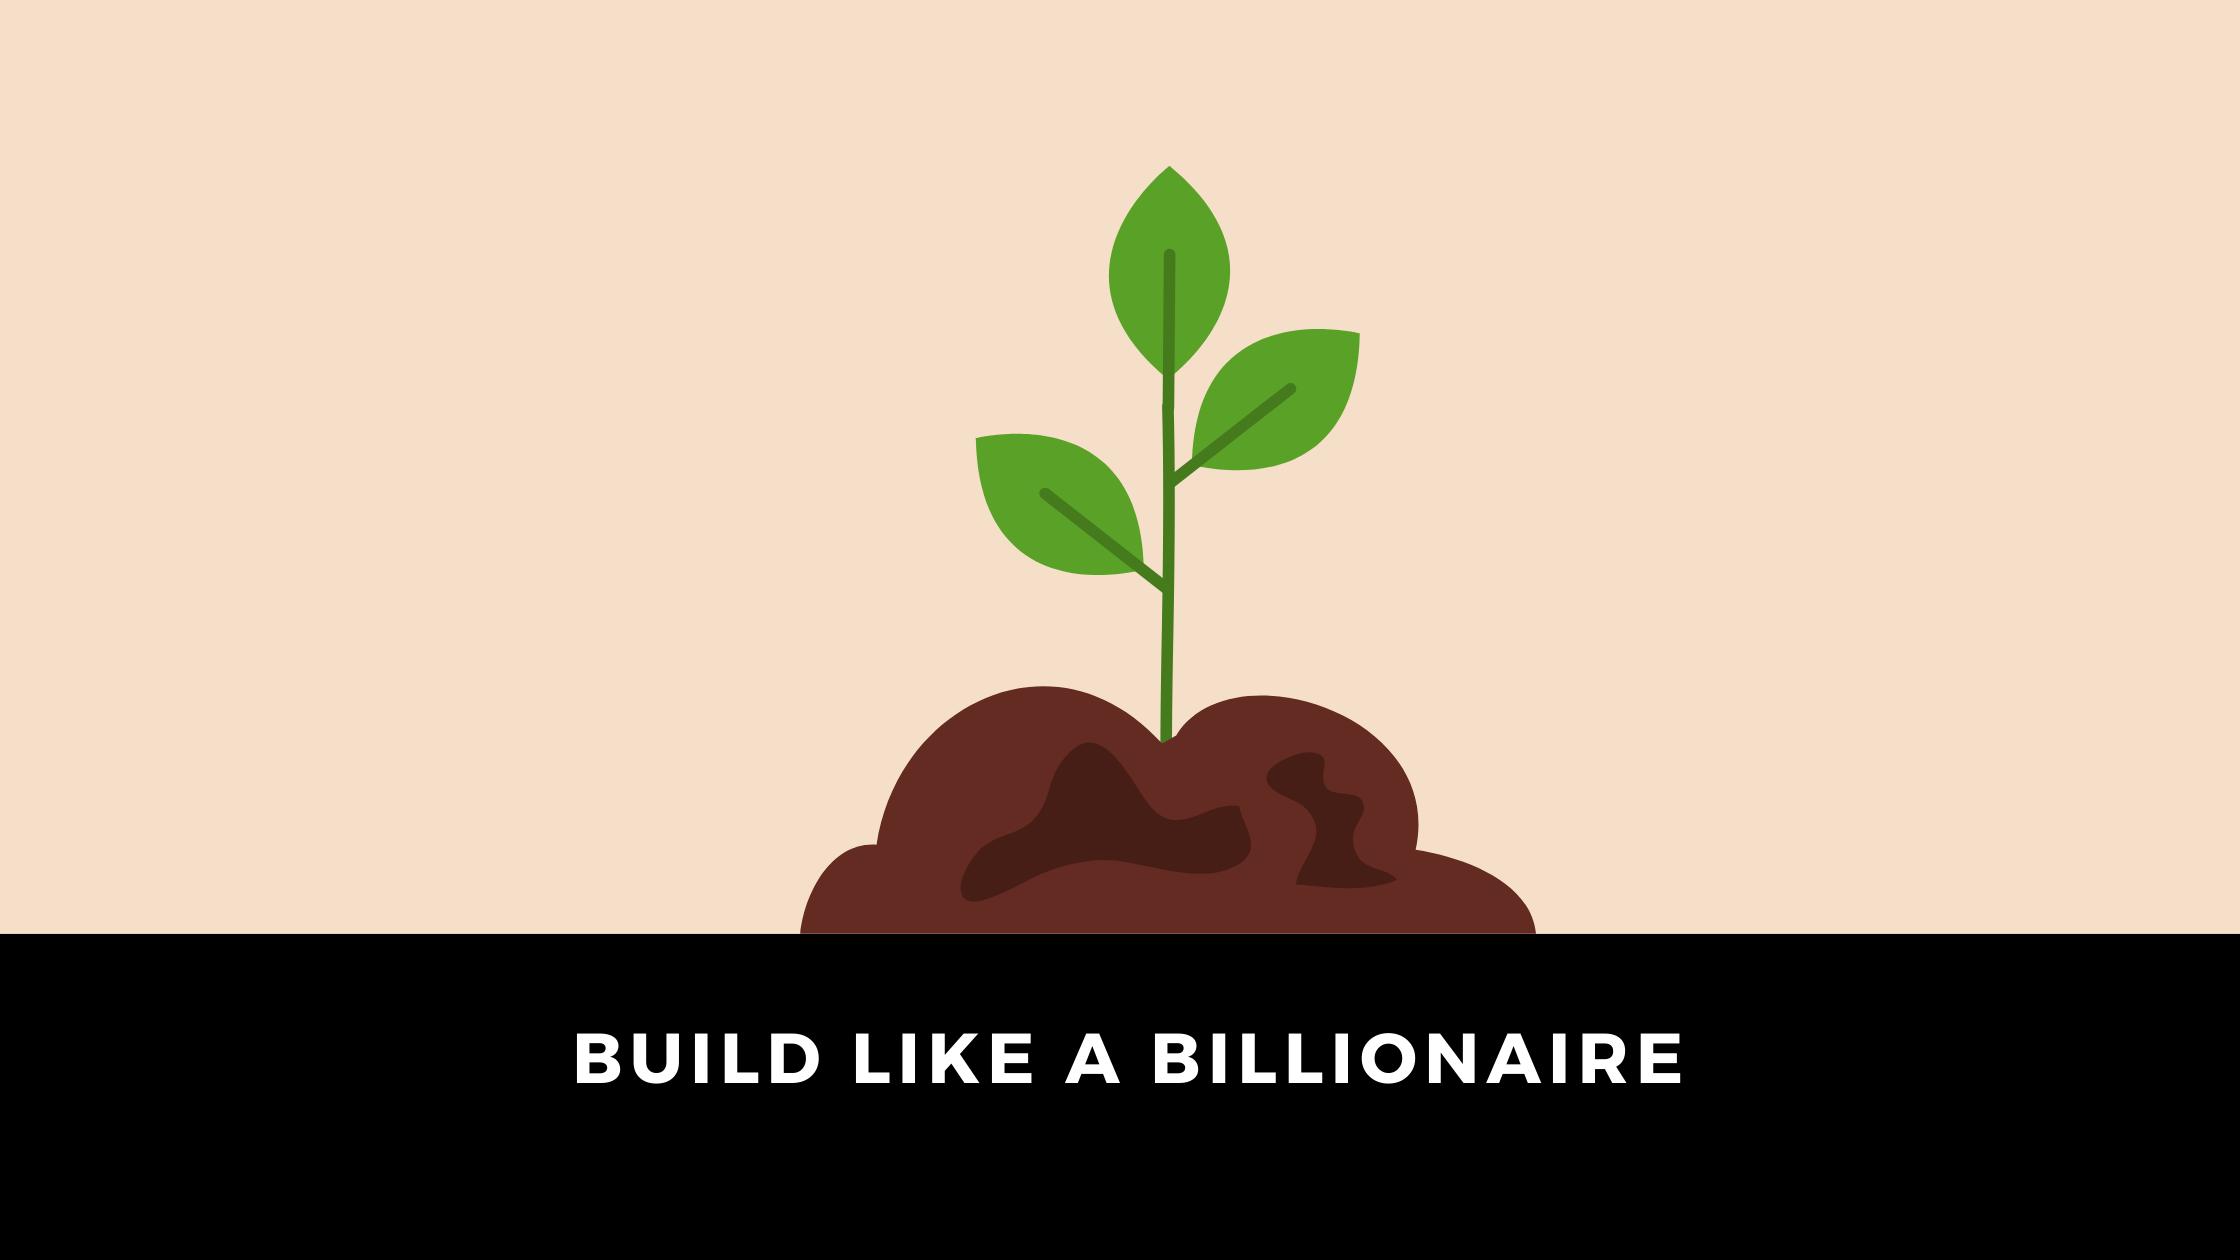 build like a billionaire